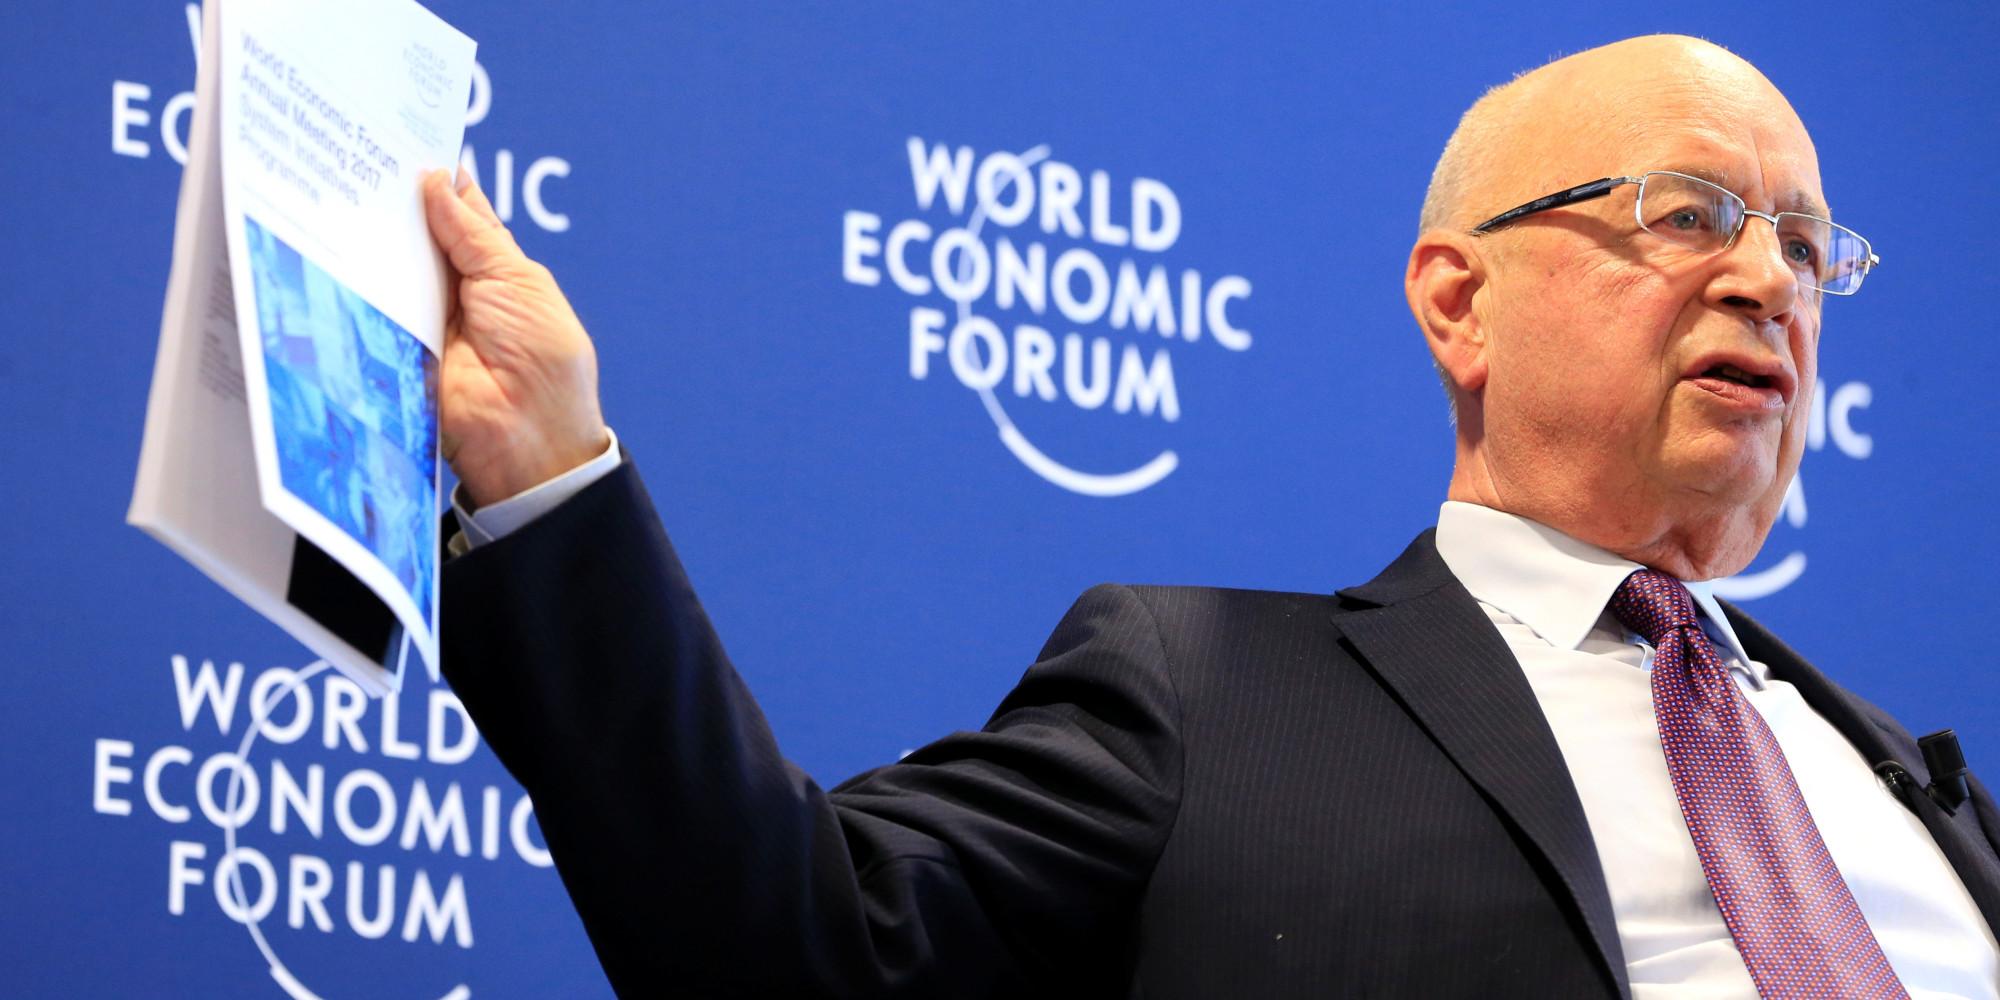 Capitalism Needs A Major Overhaul, World Economic Forum Report Says